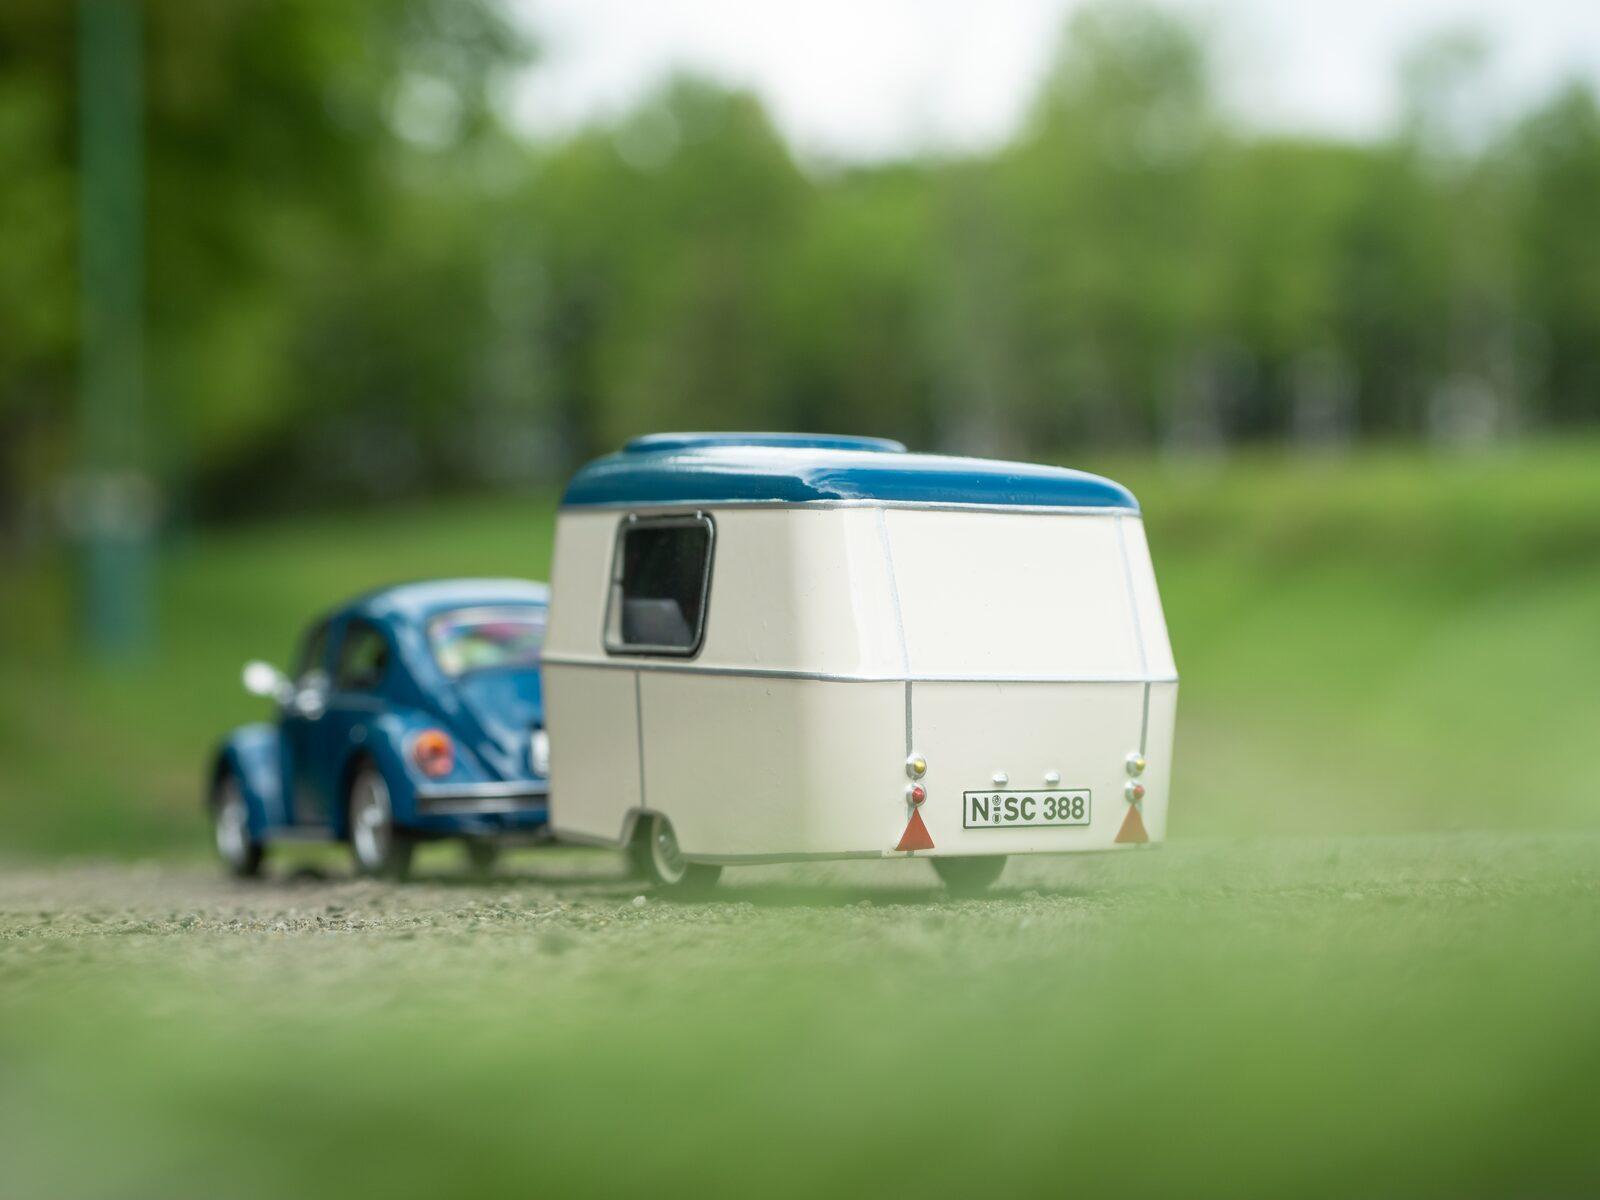 caravan auto miniatuur speelgoed